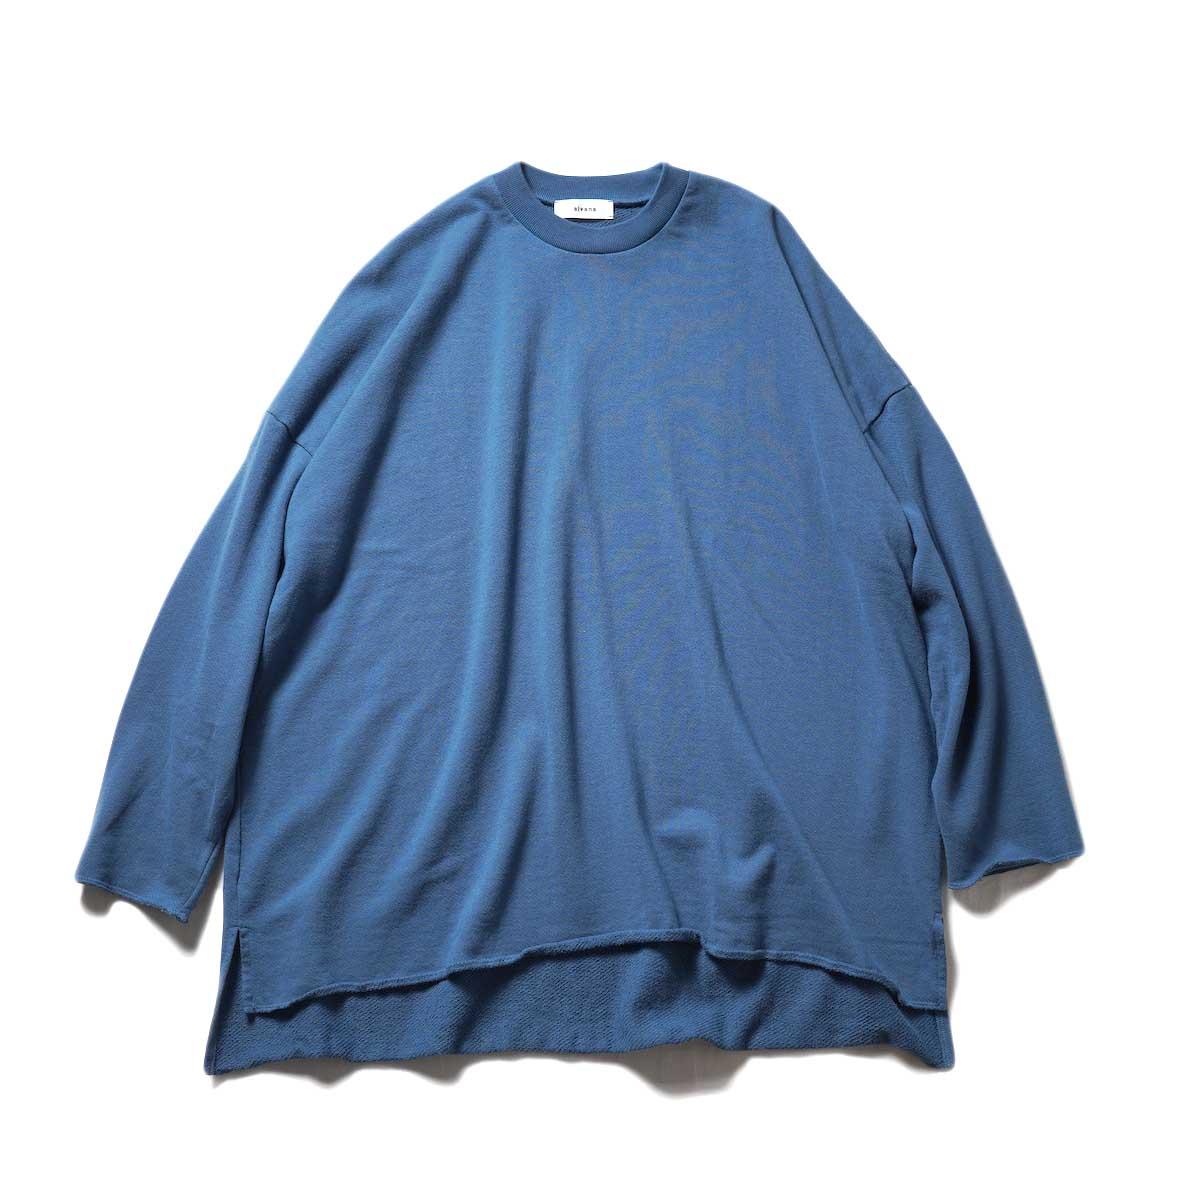 alvana / Ultimate Cut Off L/S PO (Smoke Blue)